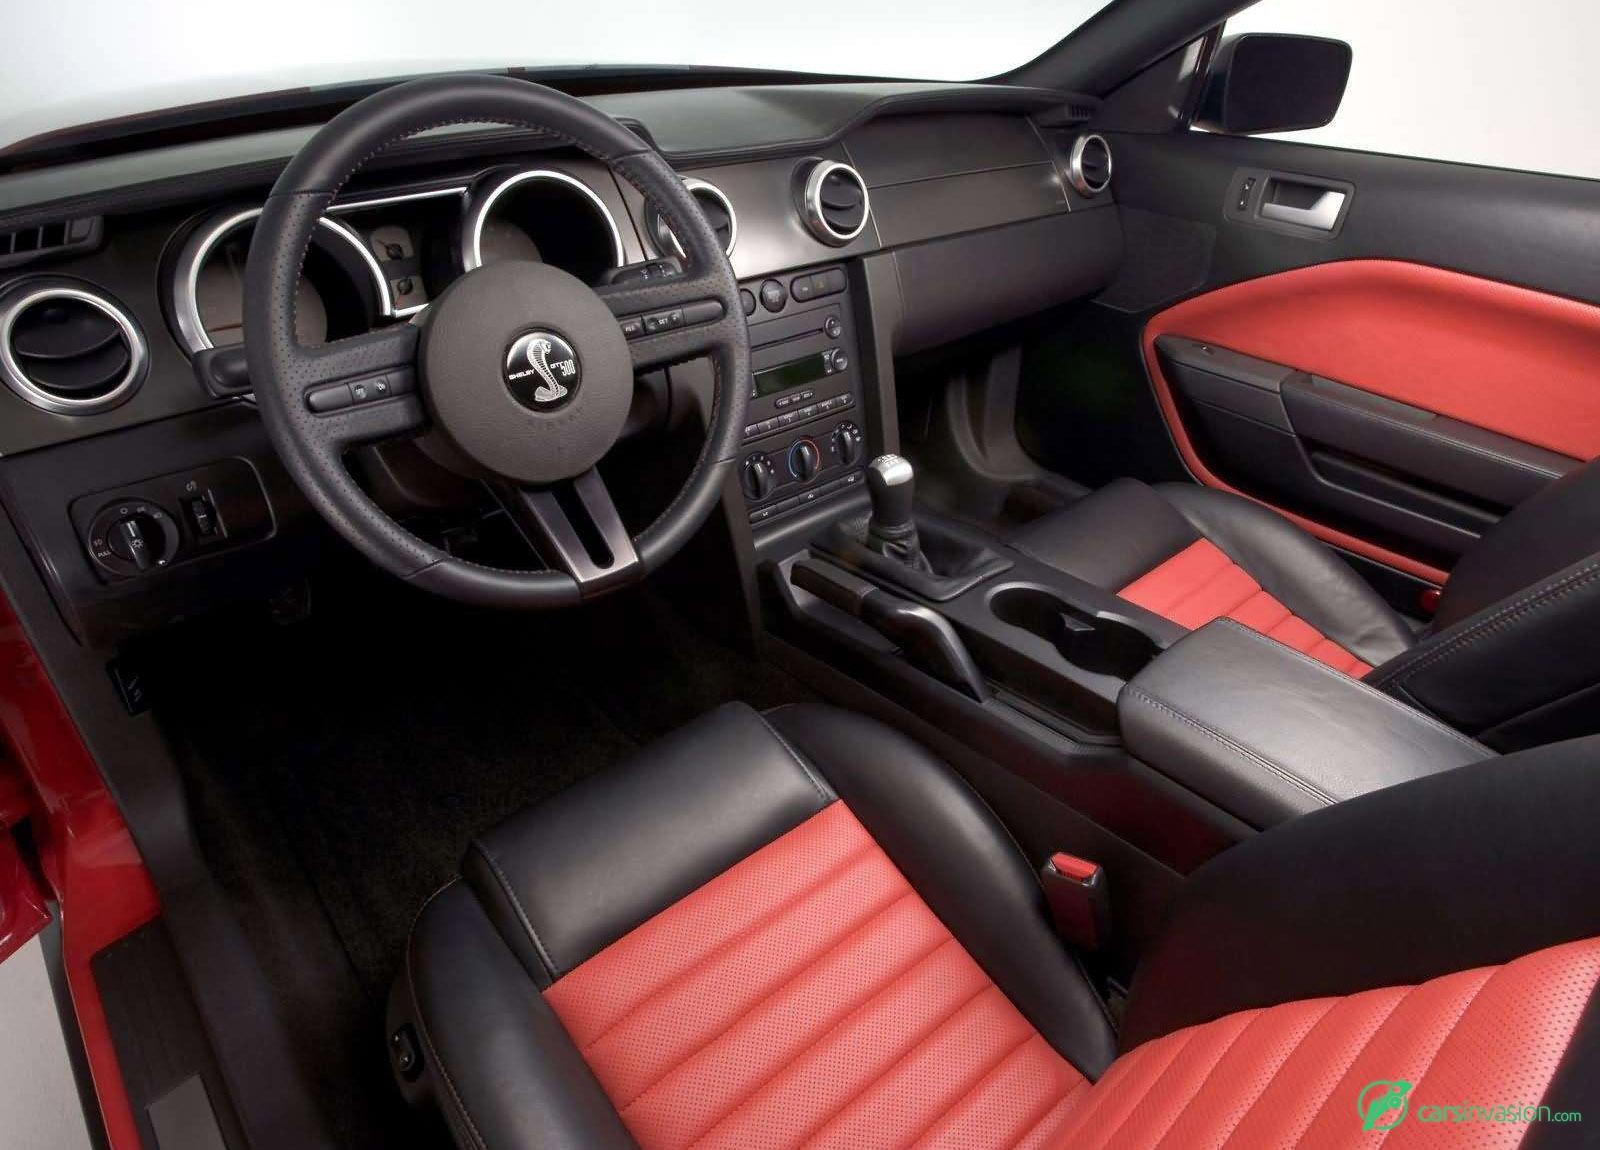 mustang shelby cobra 2005 gt500 ford interior svt 2007 gt concept carsinvasion soec weight saleen